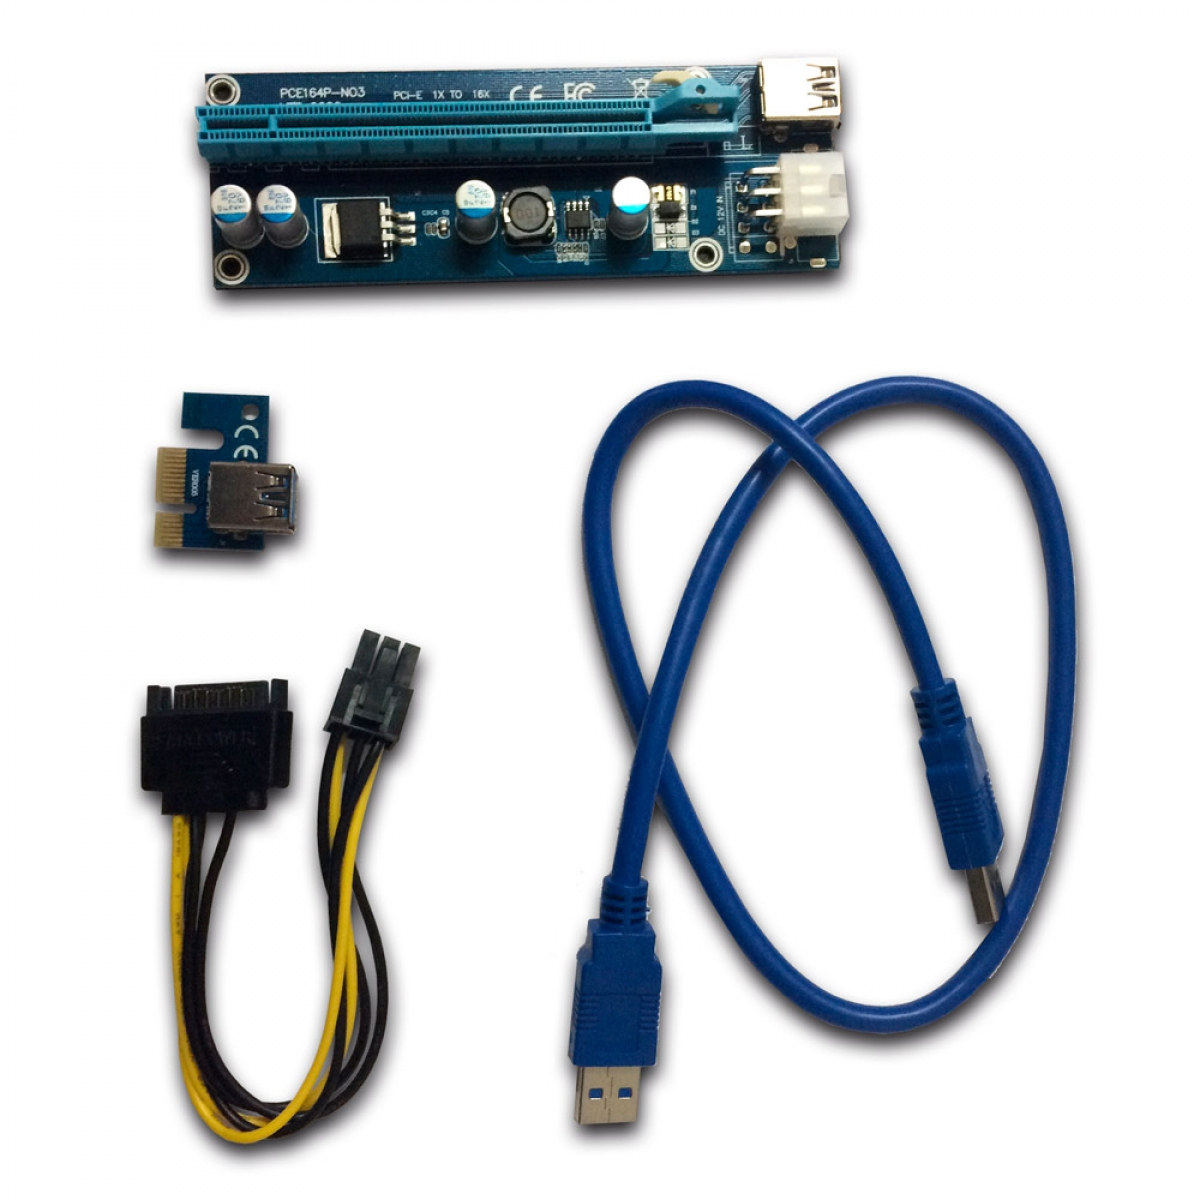 CABLE RISER CARD VER006C PCI TO 16X MINI PCI-E 60CM USB CABLE U34 P/Mineração